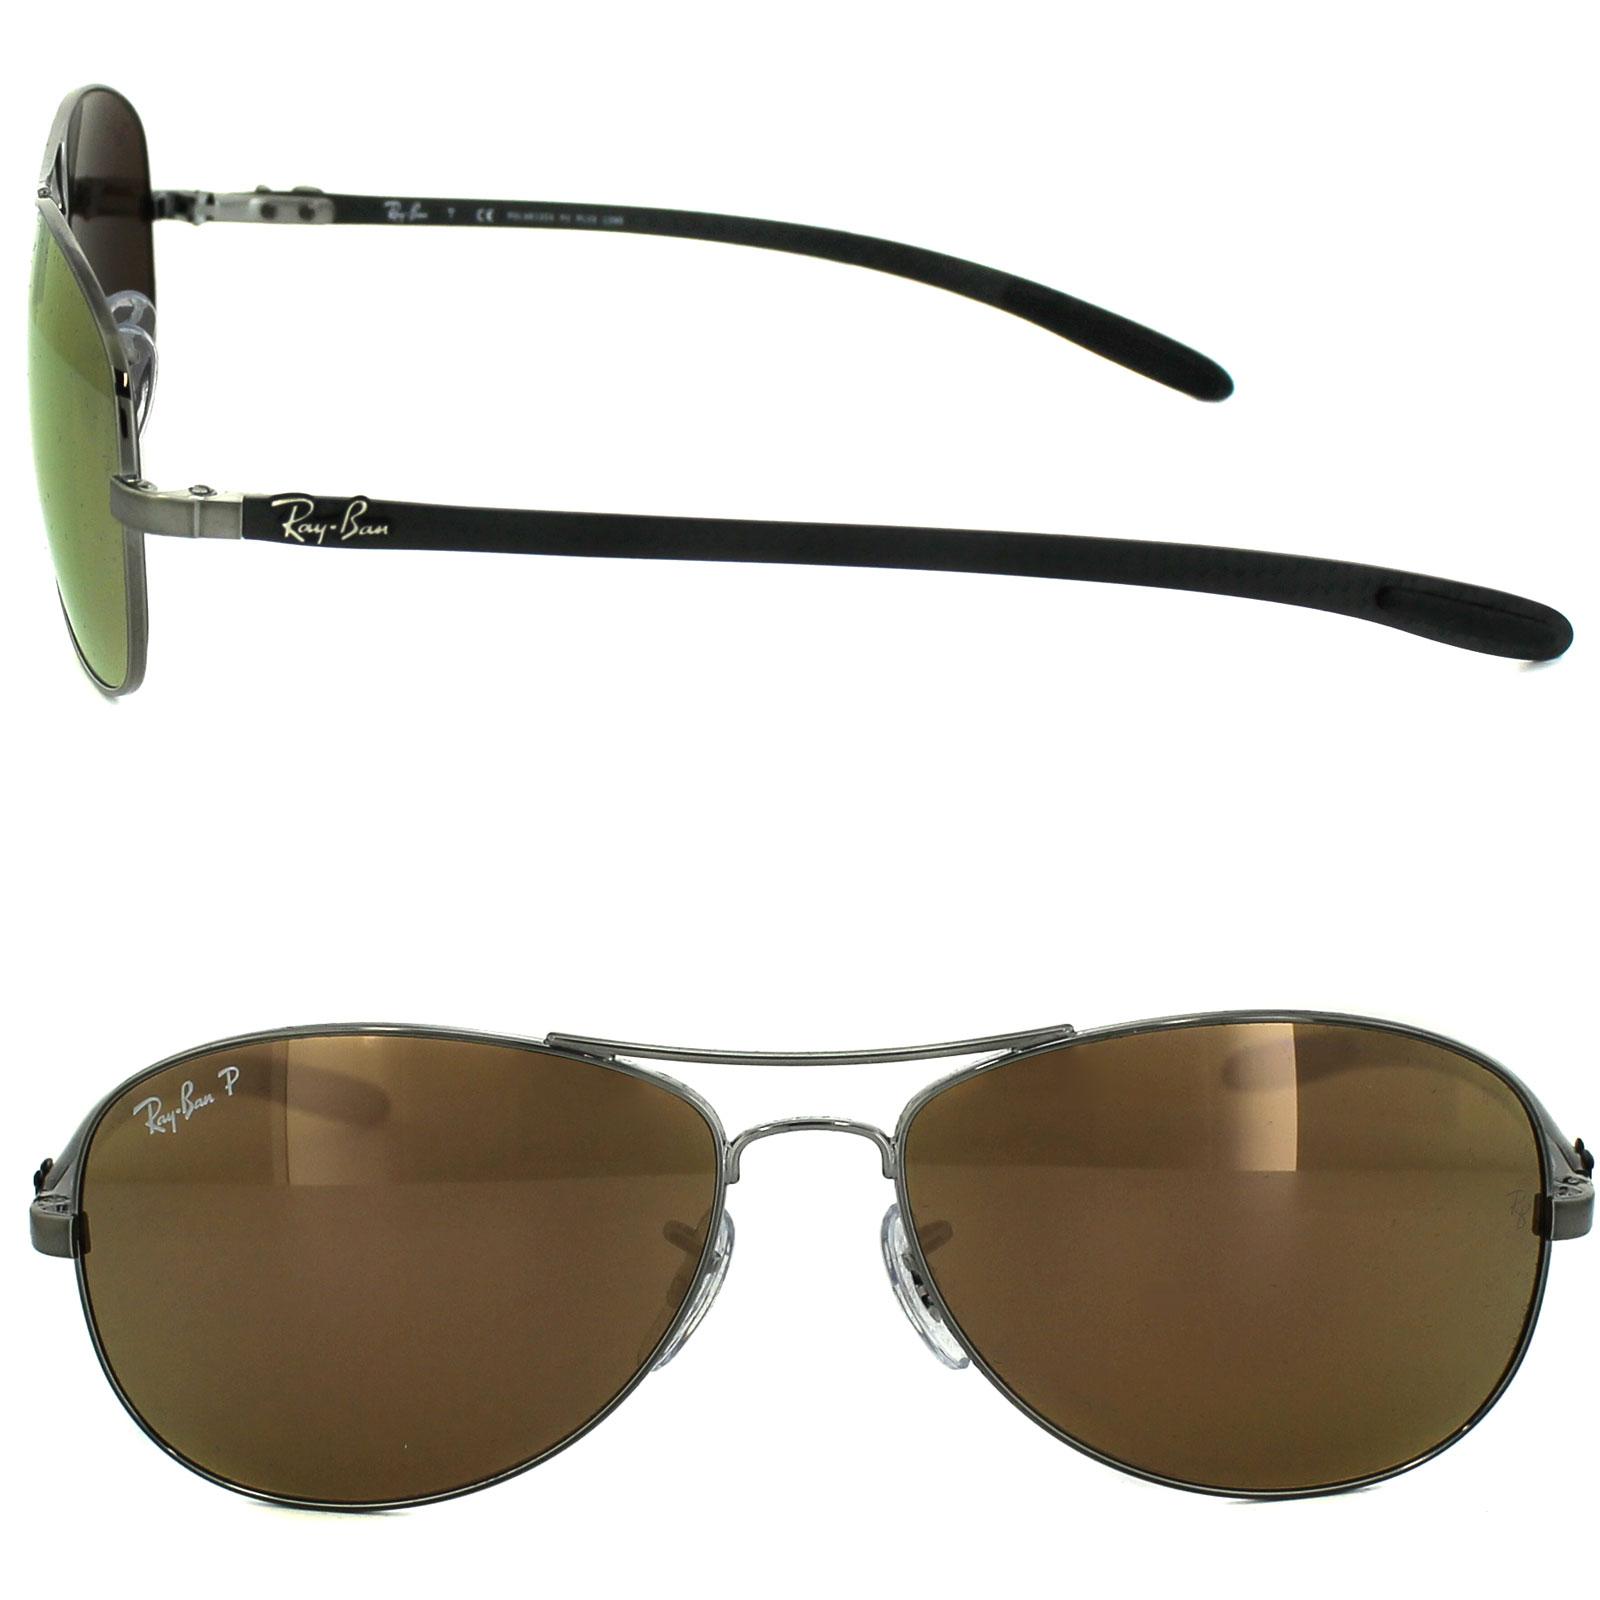 392fb88c121 Sentinel Ray-Ban Sunglasses 8301 004 N3 Shiny Gunmetal Grey Brown Mirror  Gold Polarized